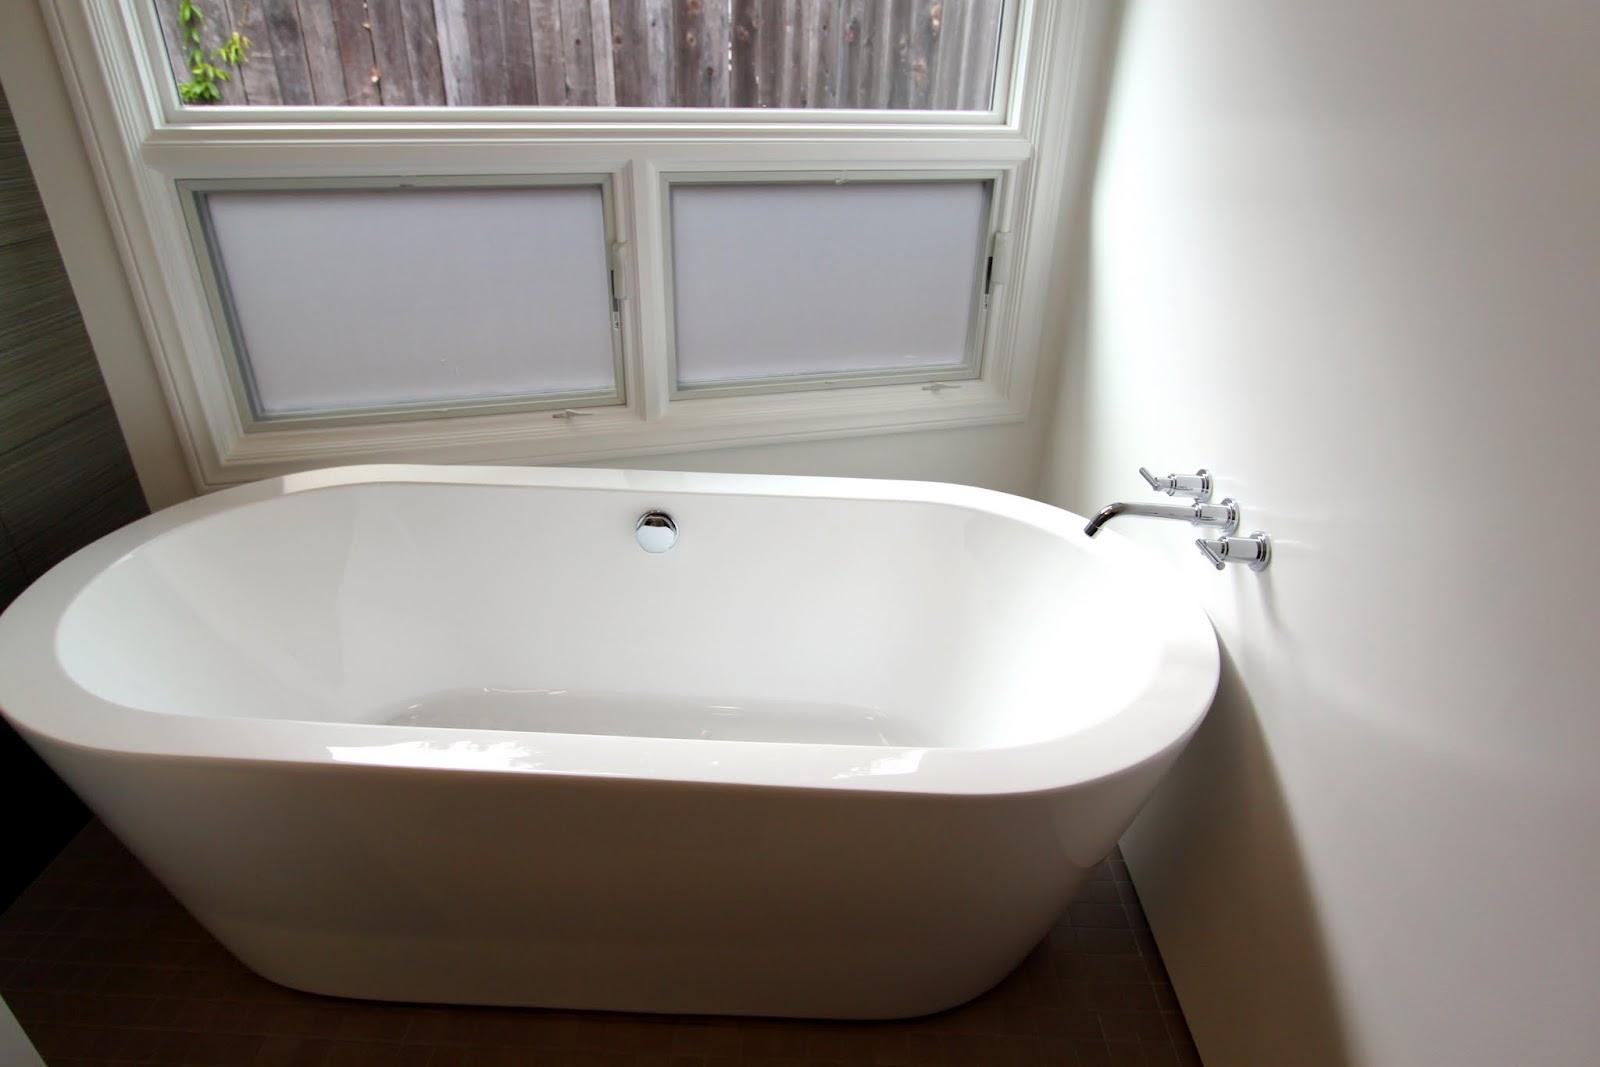 Grohe Atrio Bathroom Faucet My Web Value